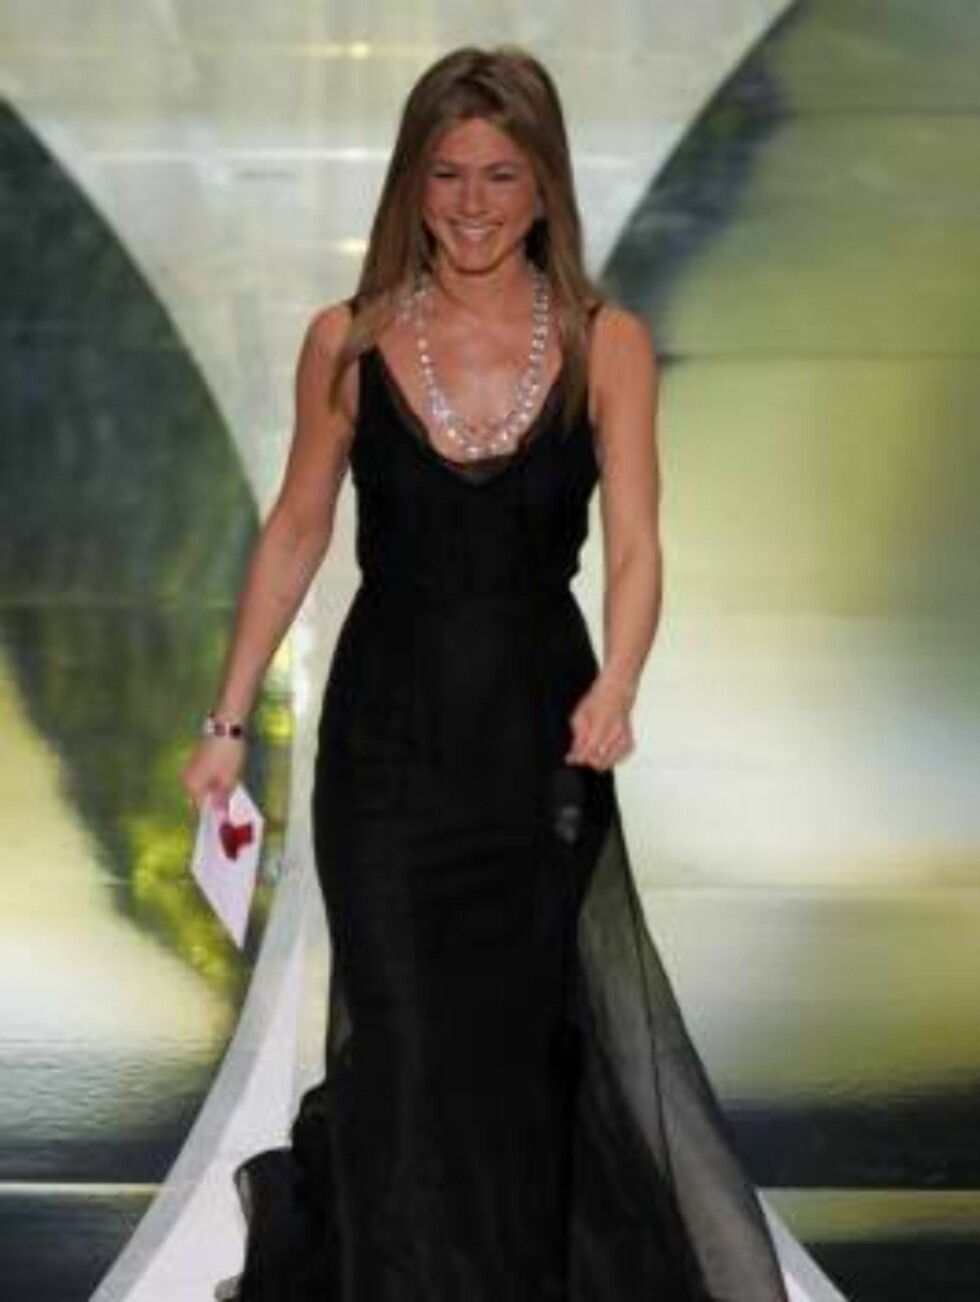 På førsteplass kom vakre Jennifer Aniston. Foto: AP/Scanpix